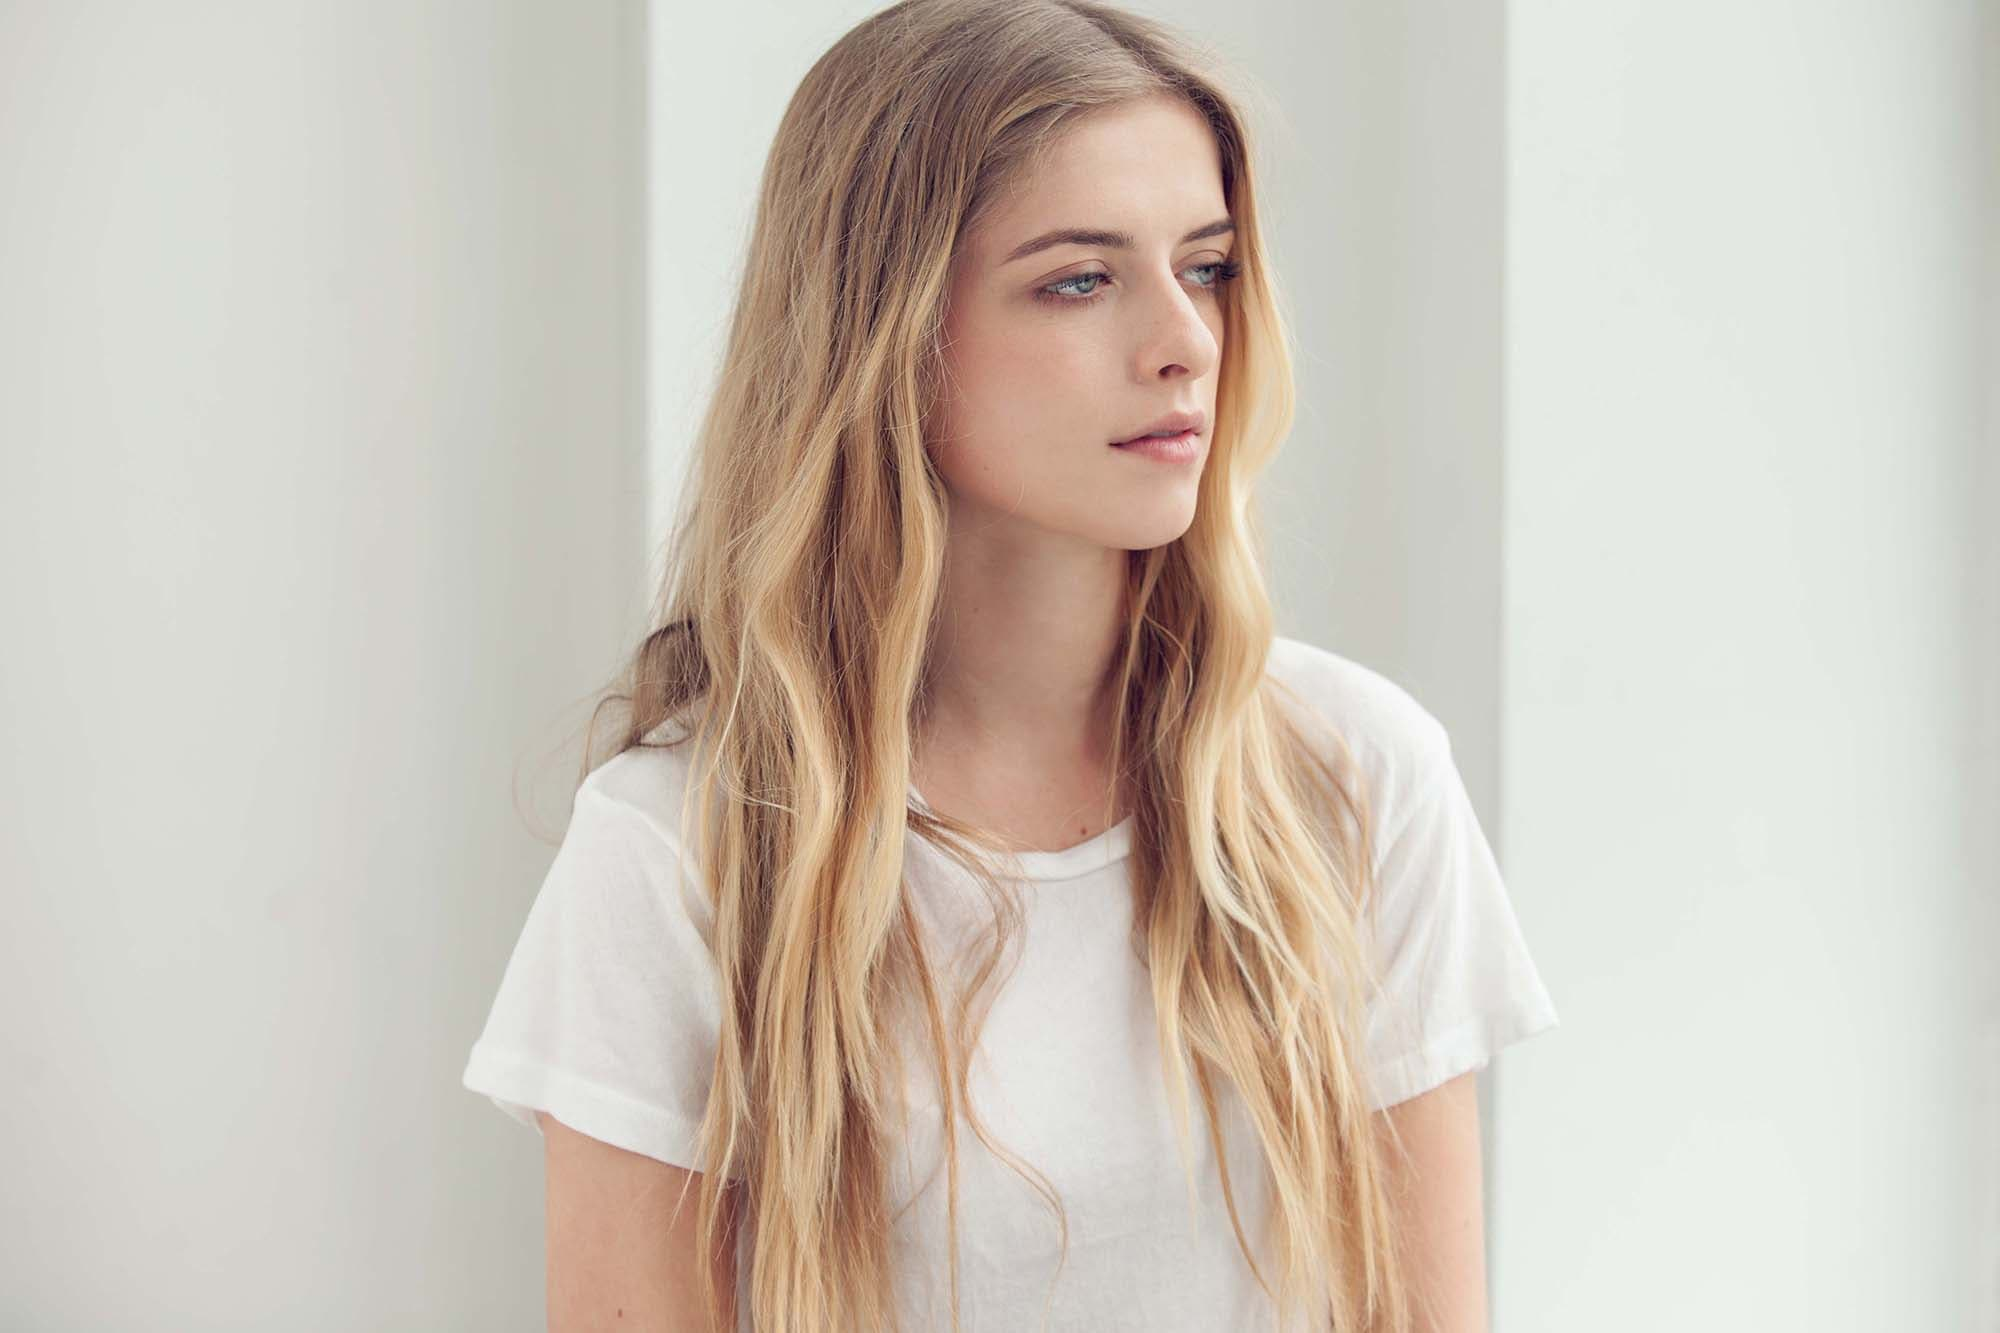 Chica rubia con peinado messy